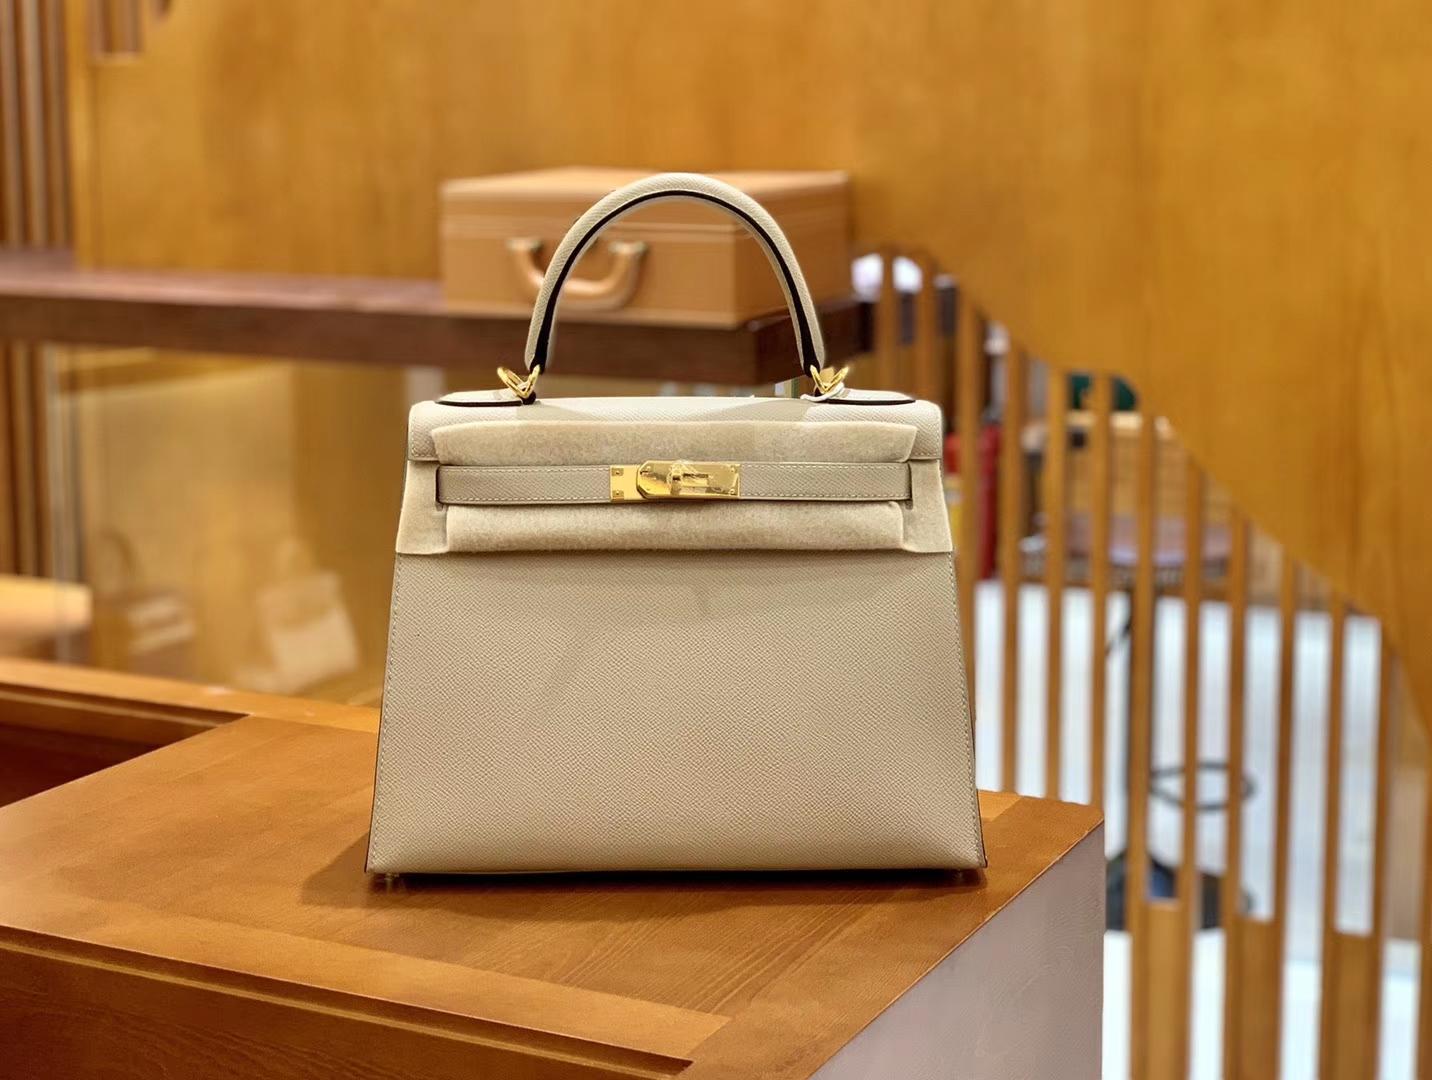 Hermès(爱马仕)Kelly 28cm 斑鸠灰 金扣 Epsom掌纹牛皮 全手工缝制 臻品级别